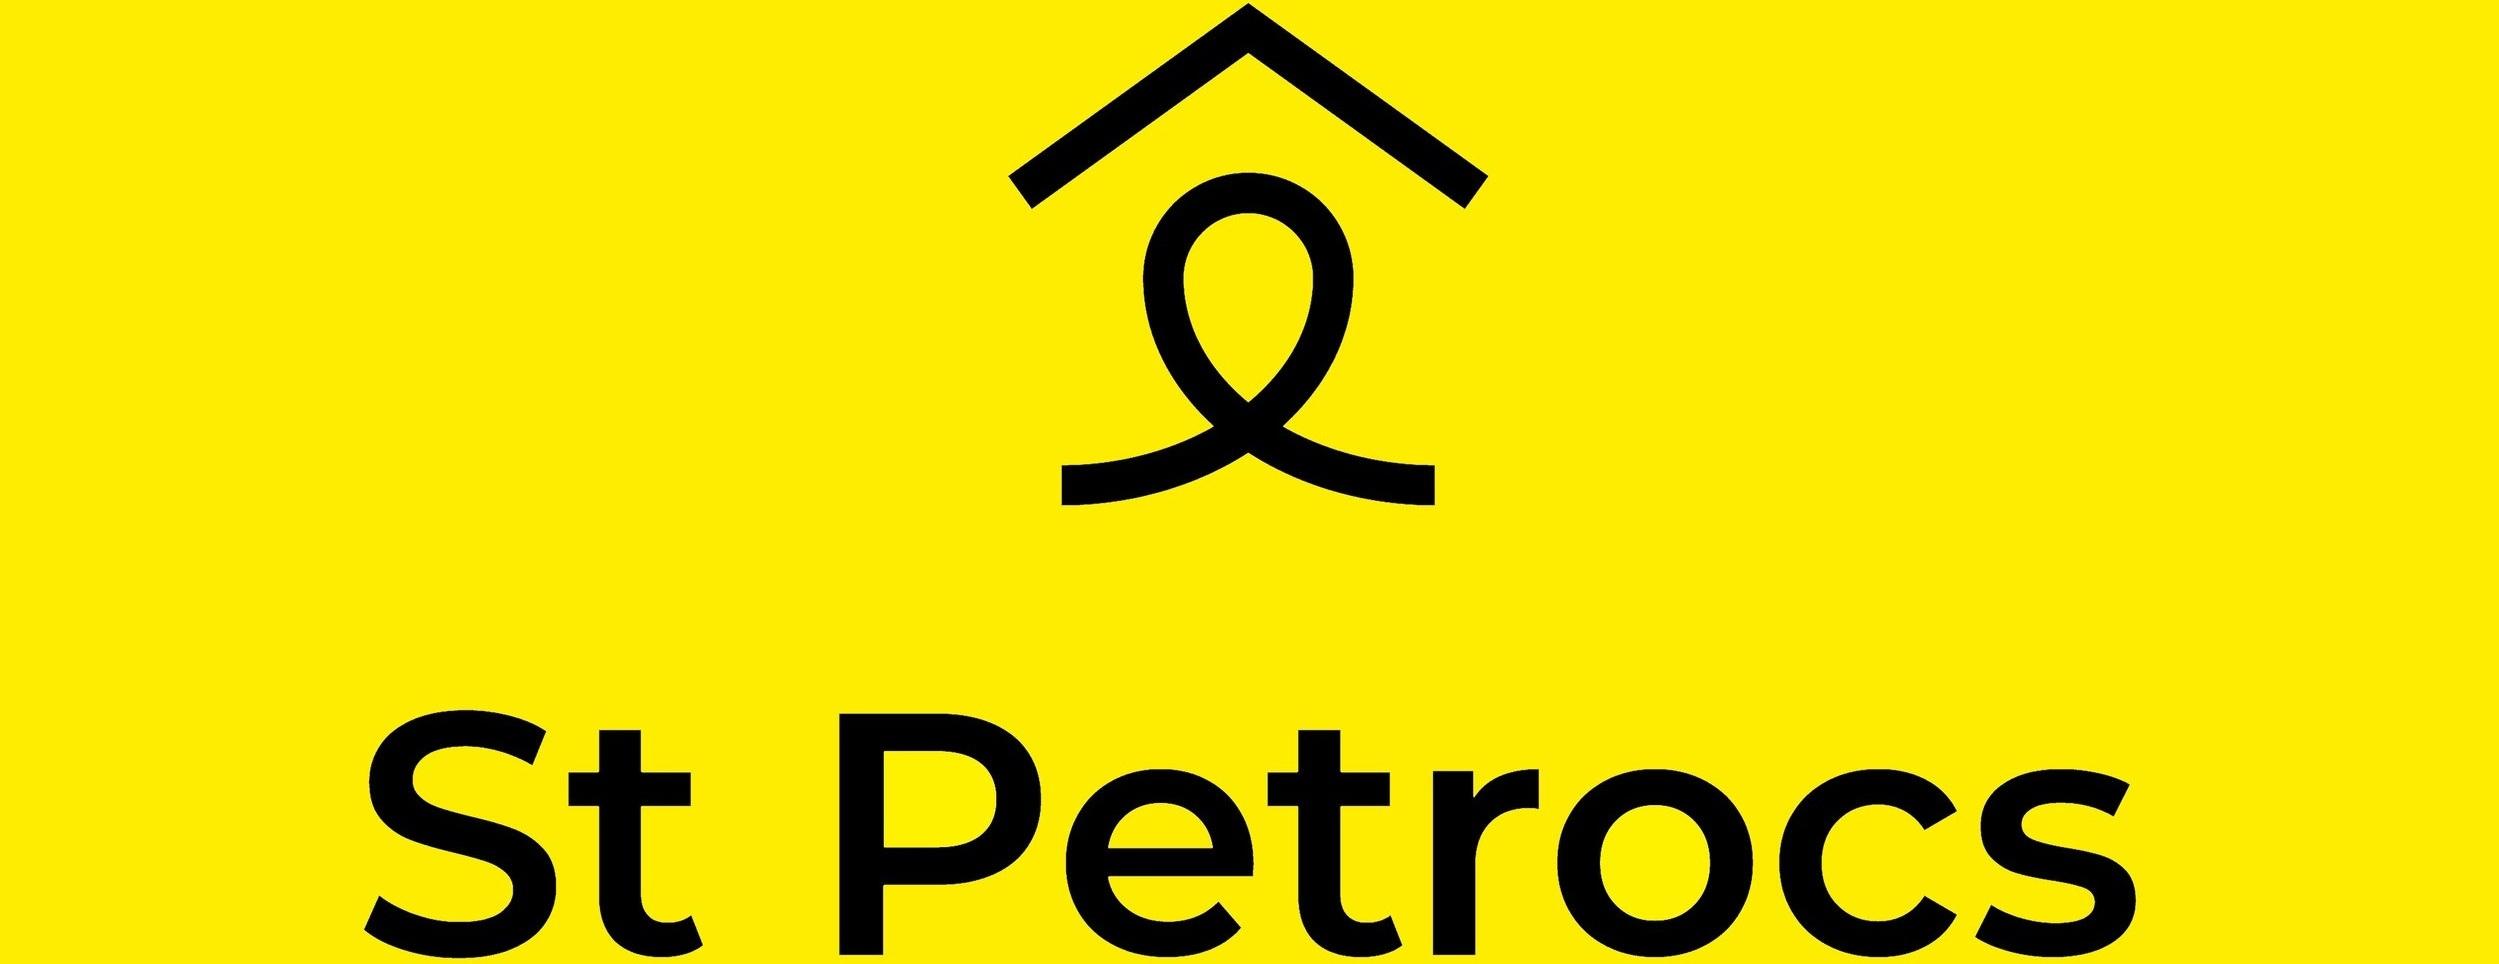 St-Petrocs_Primary%2Byellow%2Bbackground.jpg